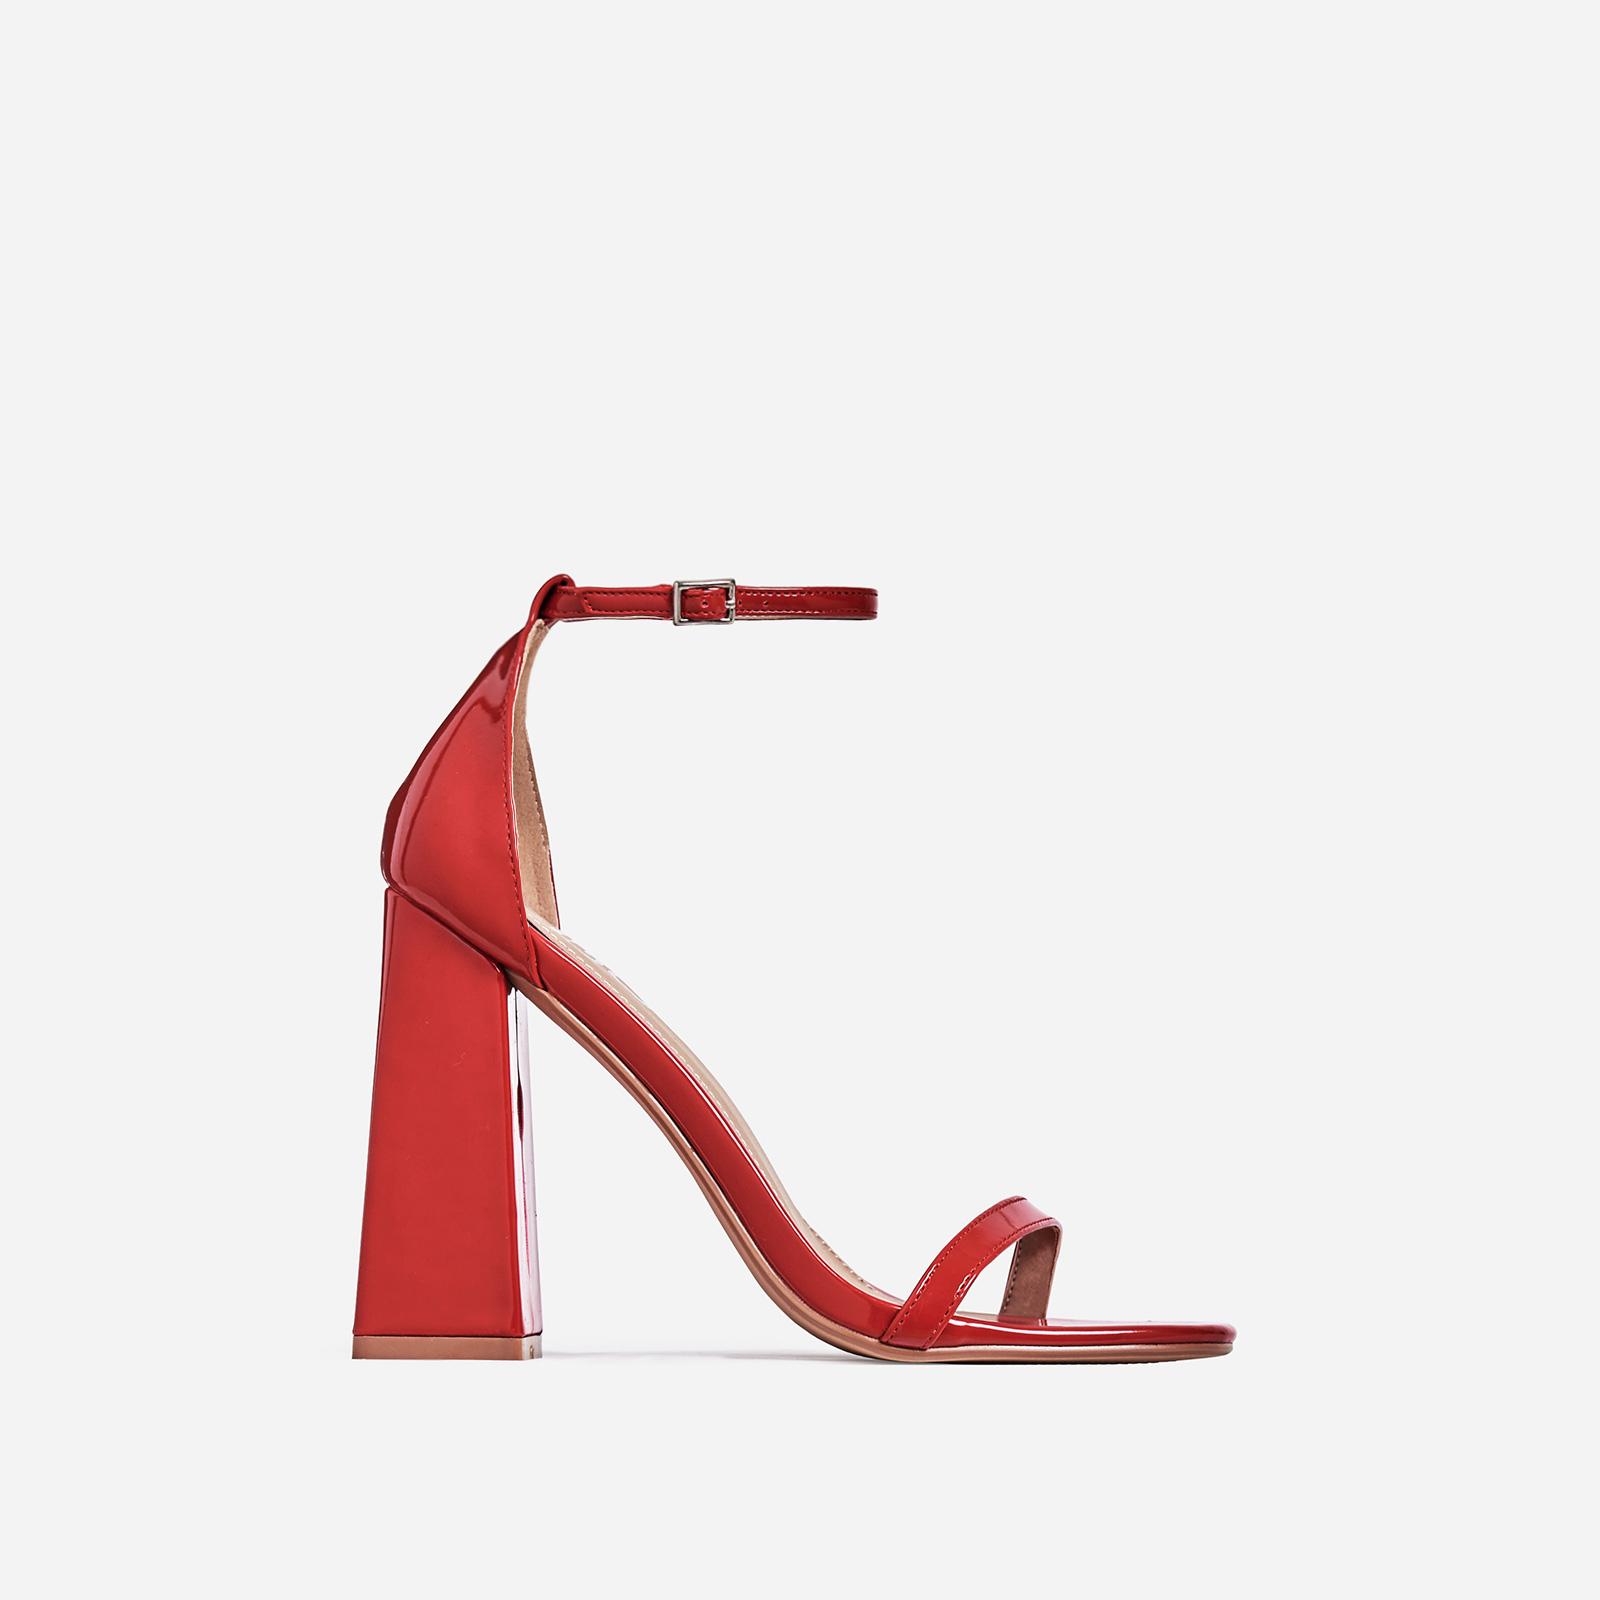 Atomic Square Block Heel In Red Patent